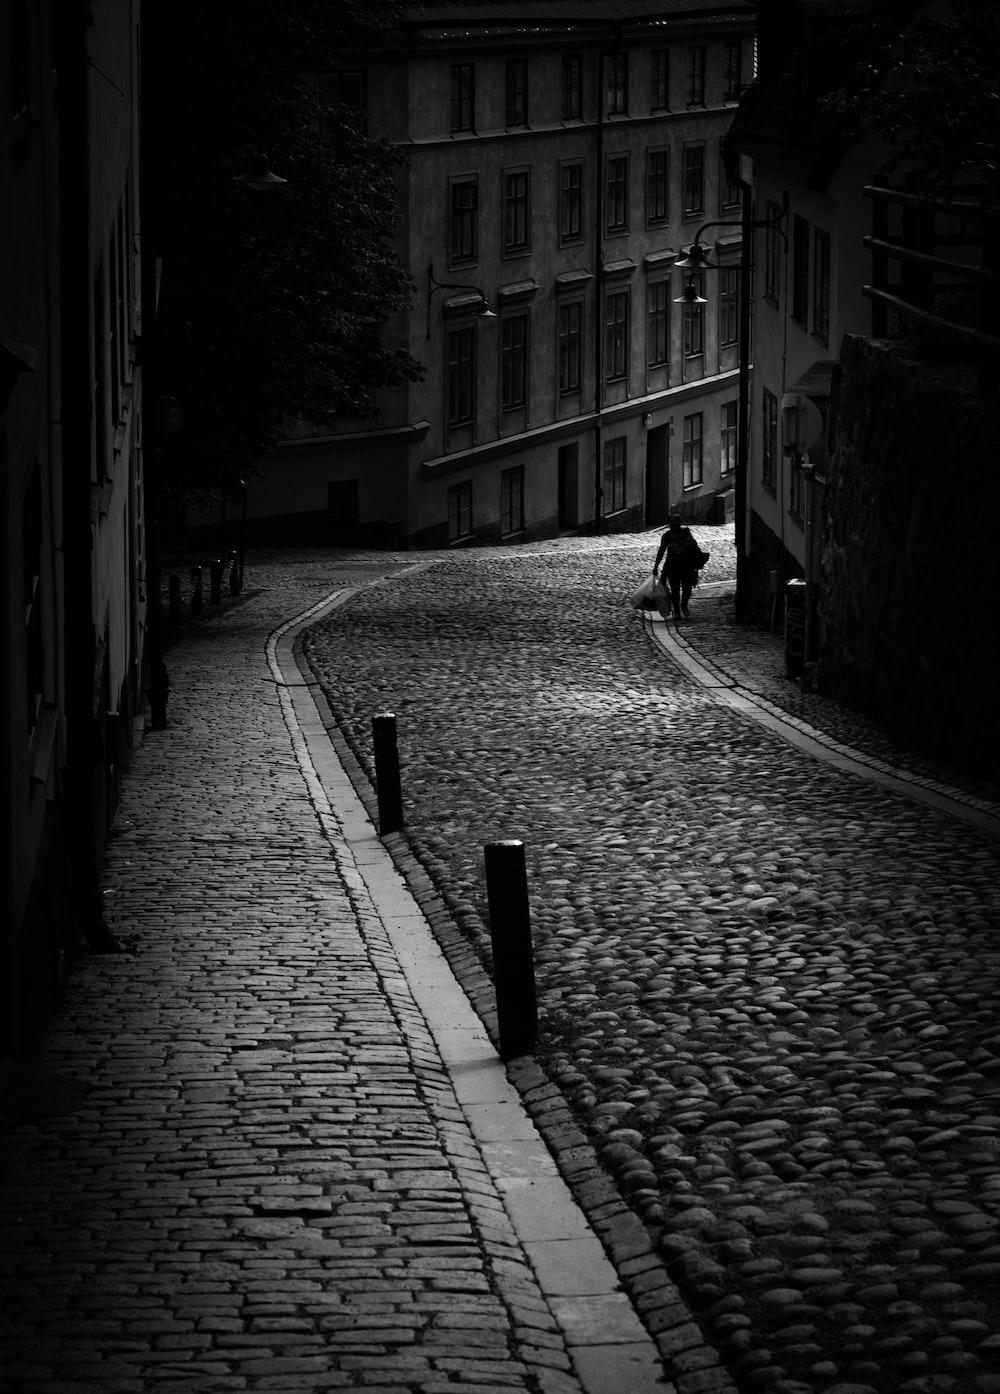 grayscale photo of person walking on sidewalk